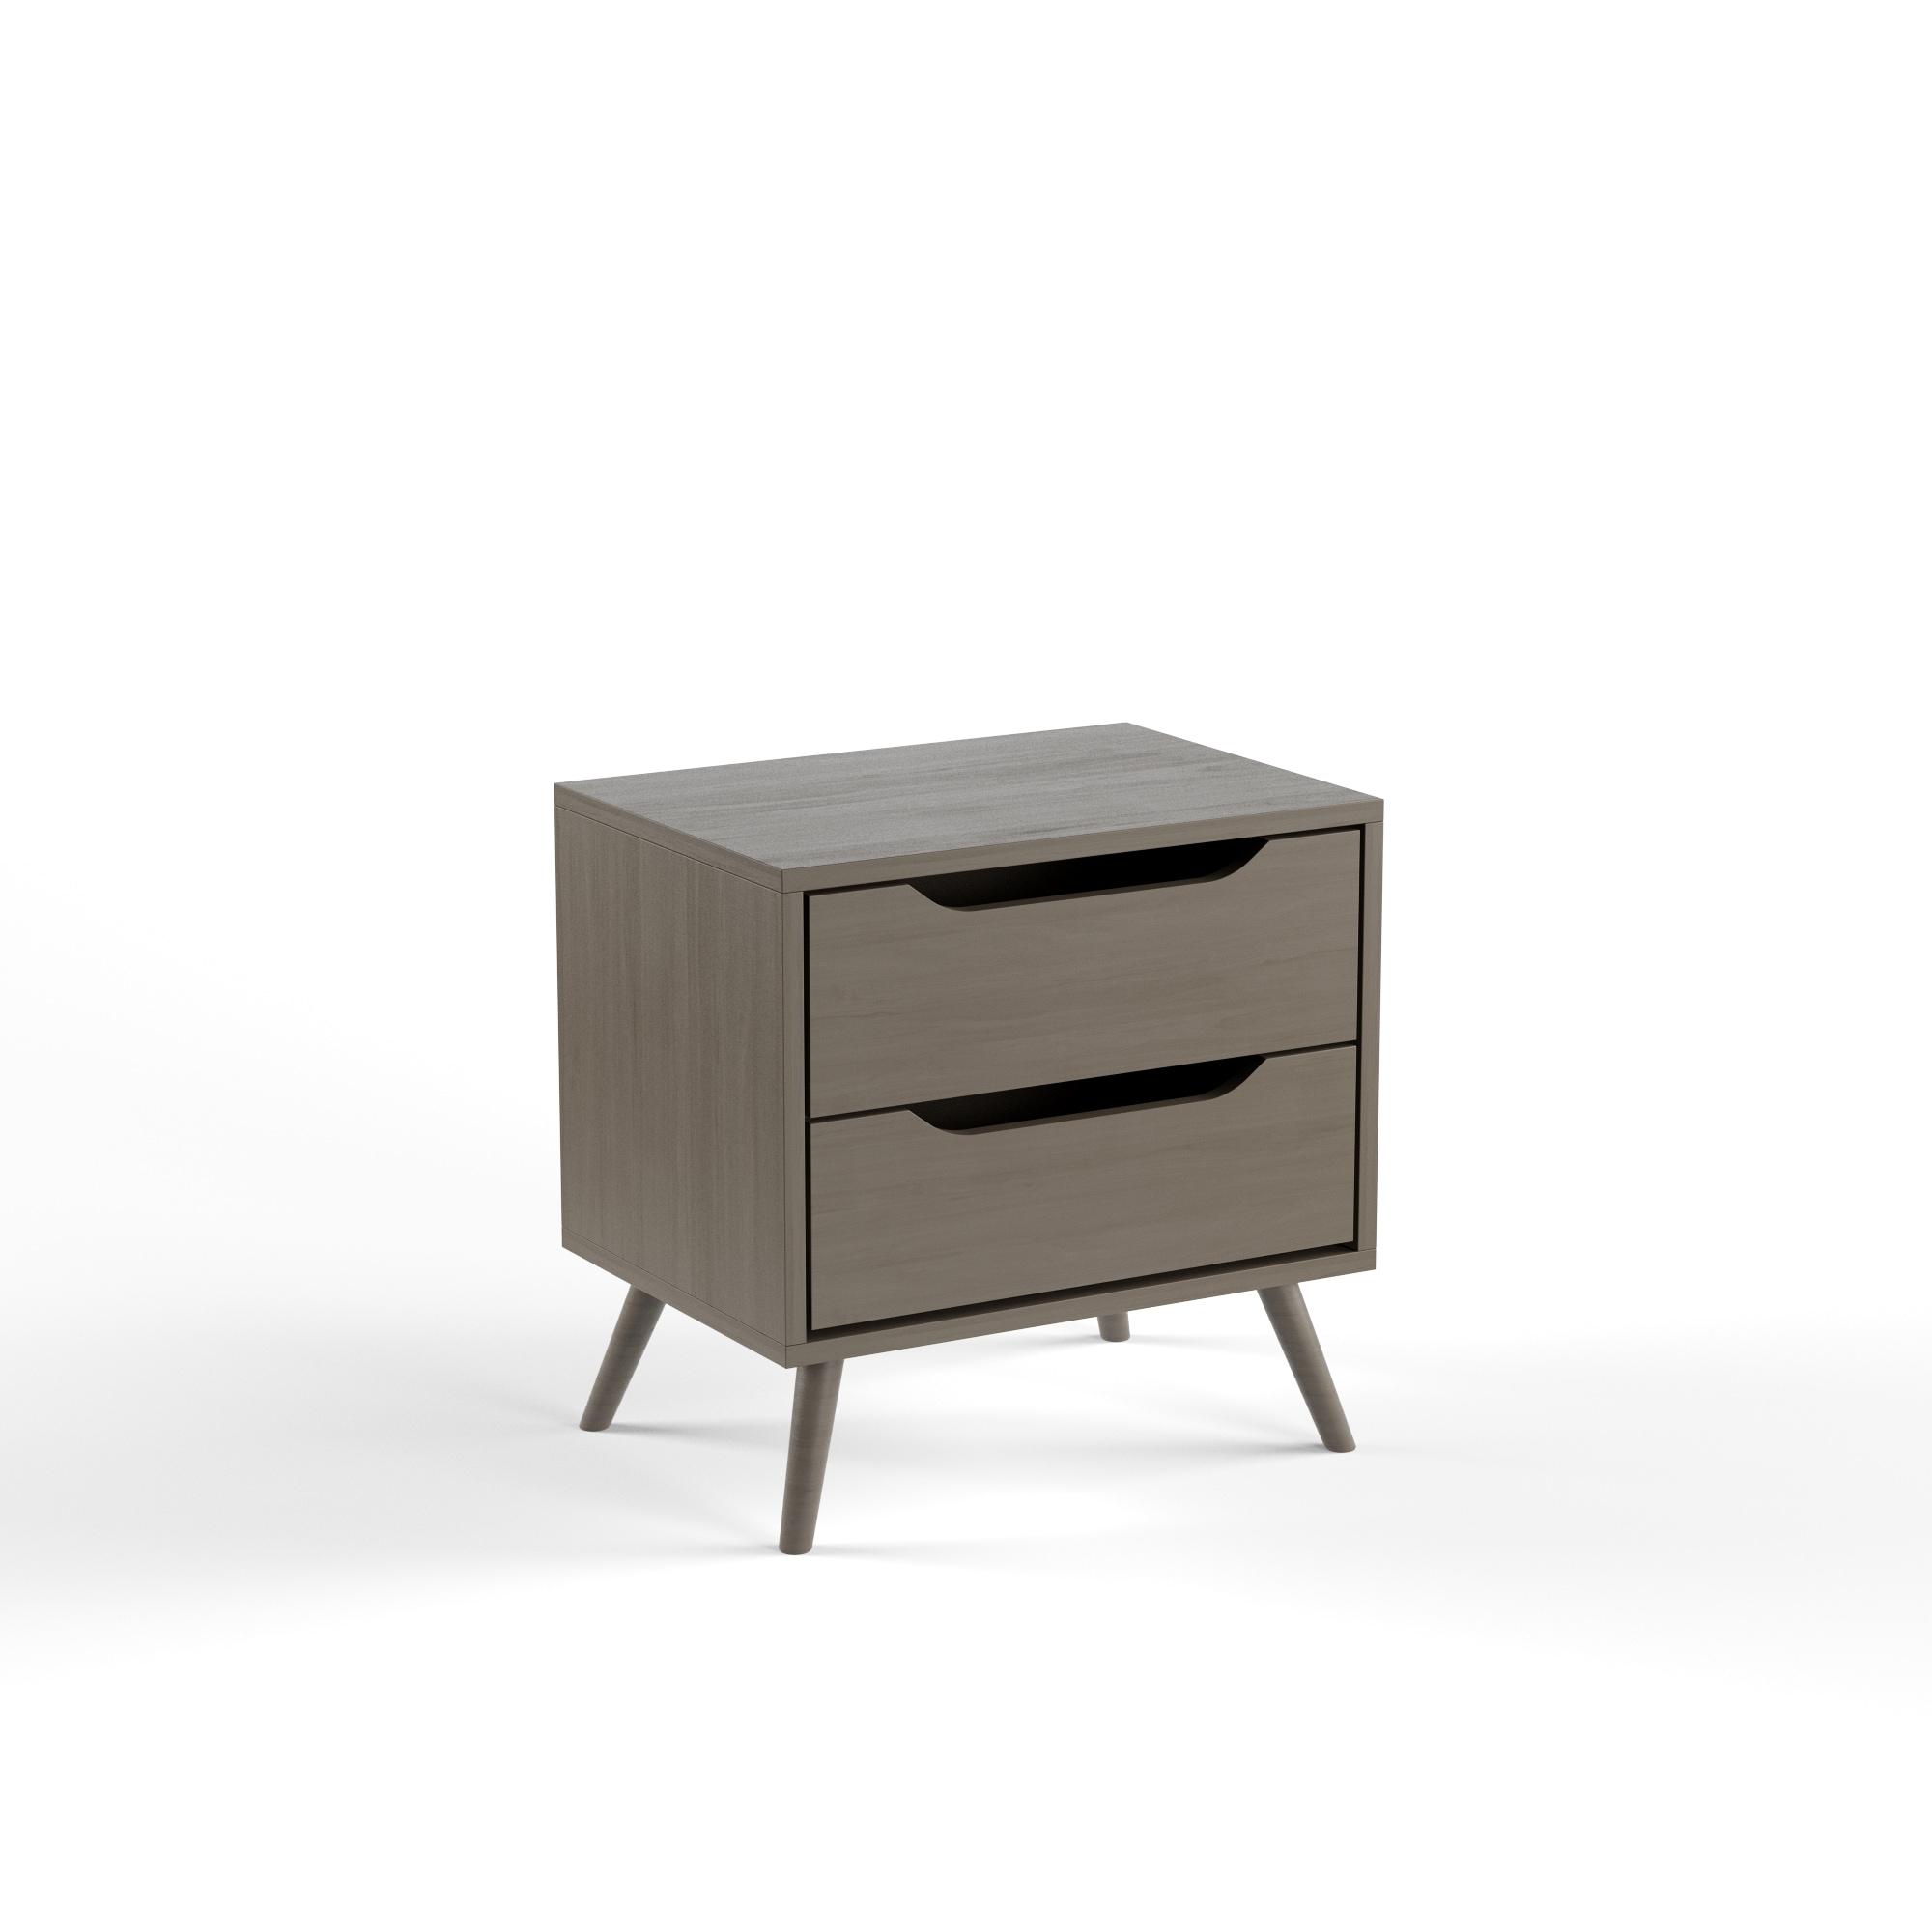 MidCentury Modern Furniture For Less Overstockcom